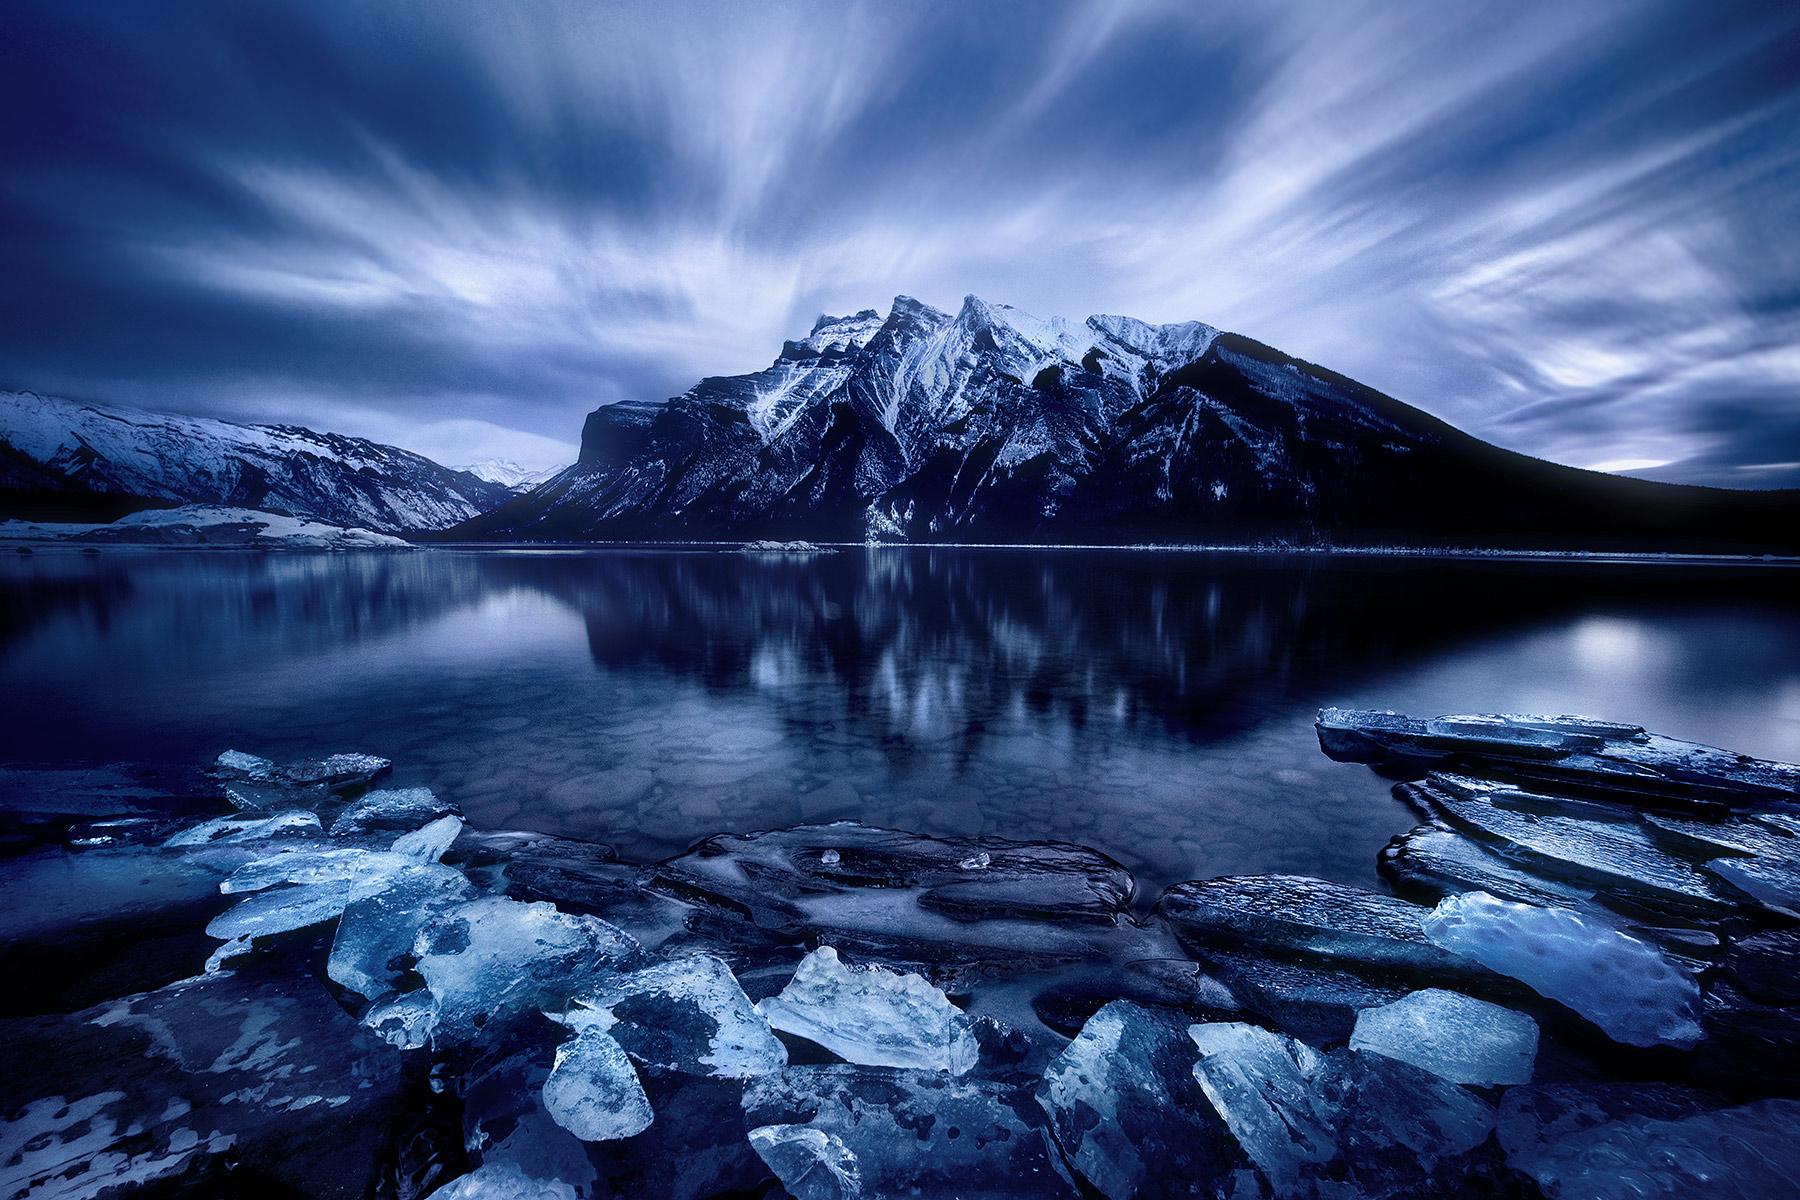 Canadian Rockies, Ice, Shore, Alberta, photo